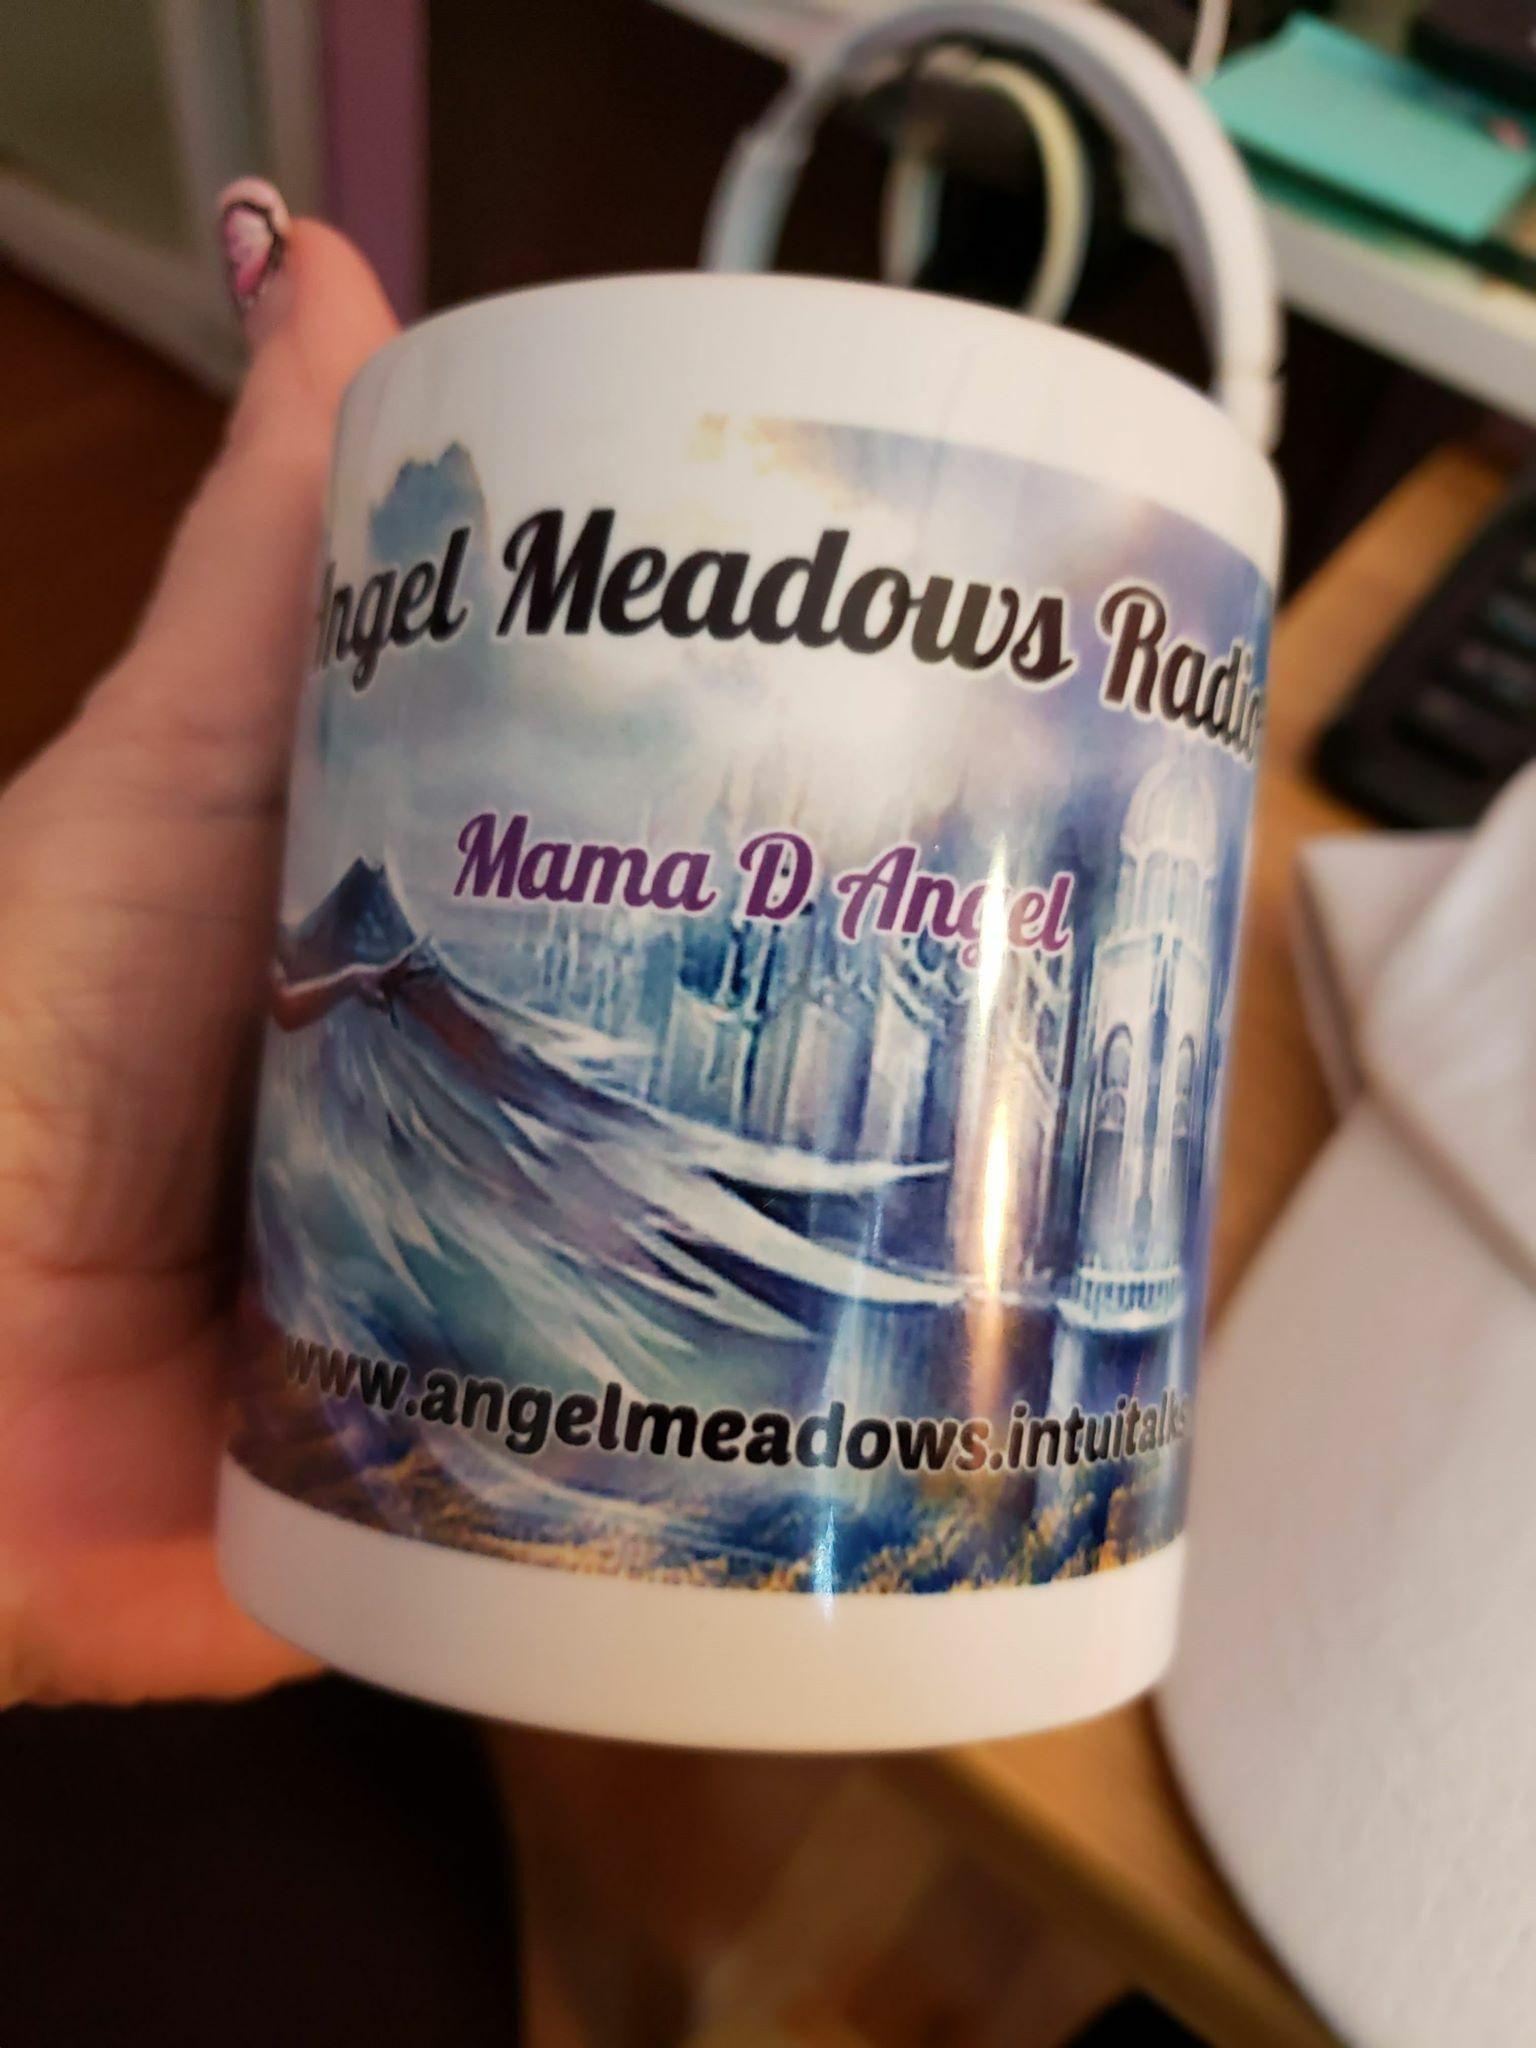 Angel Meadows Radio Mug 00000